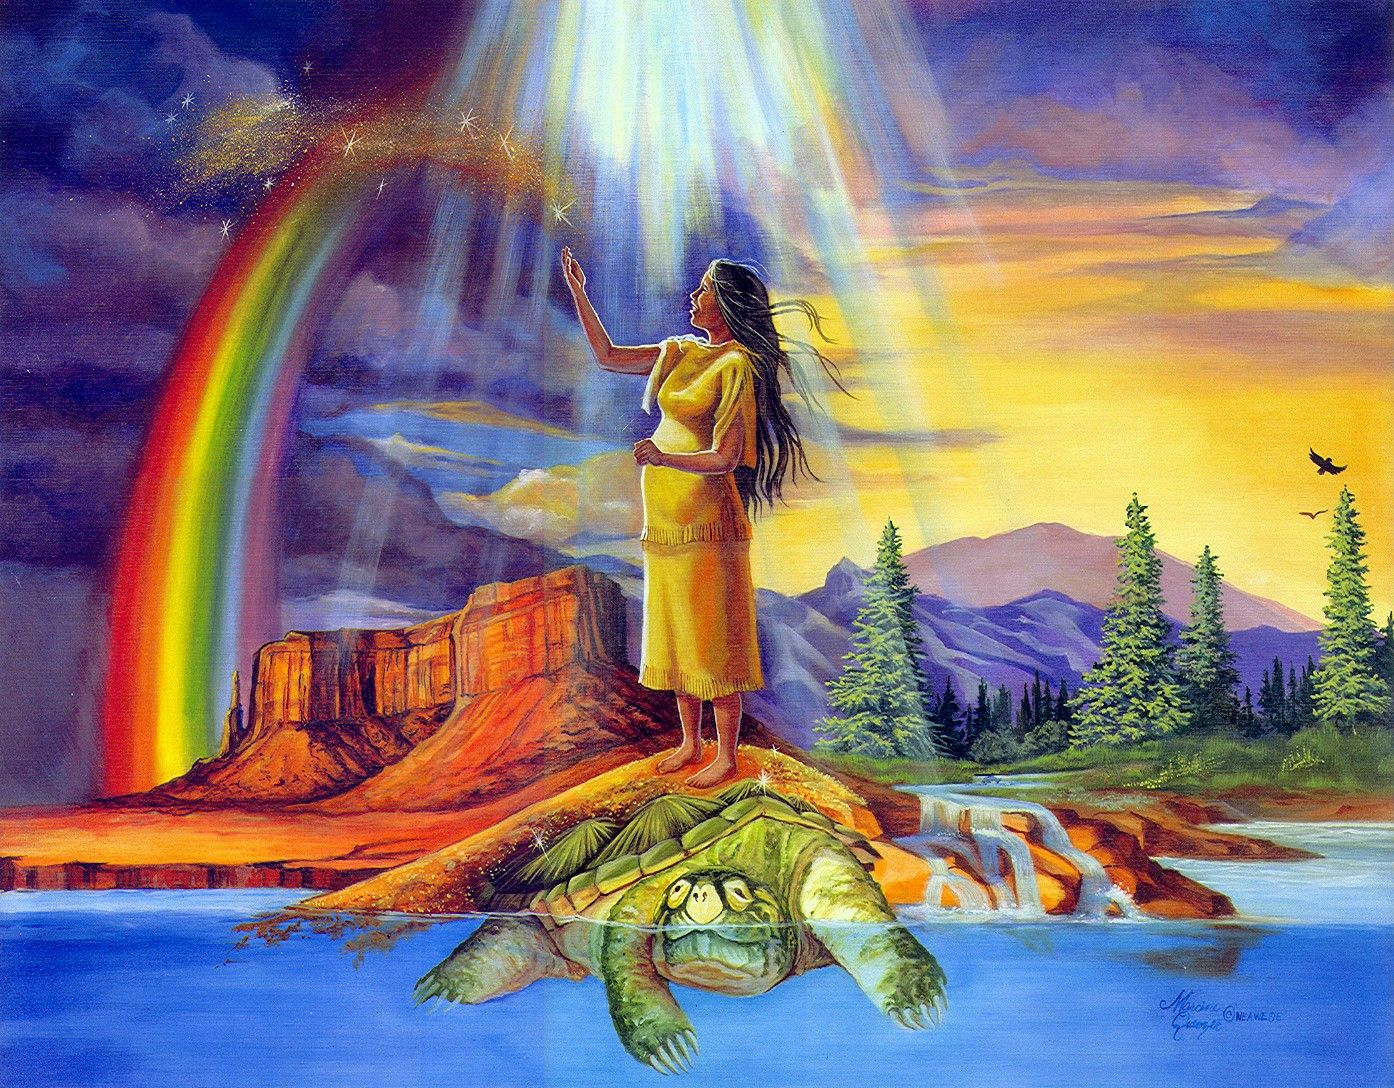 Airoquios creation native american art creation story